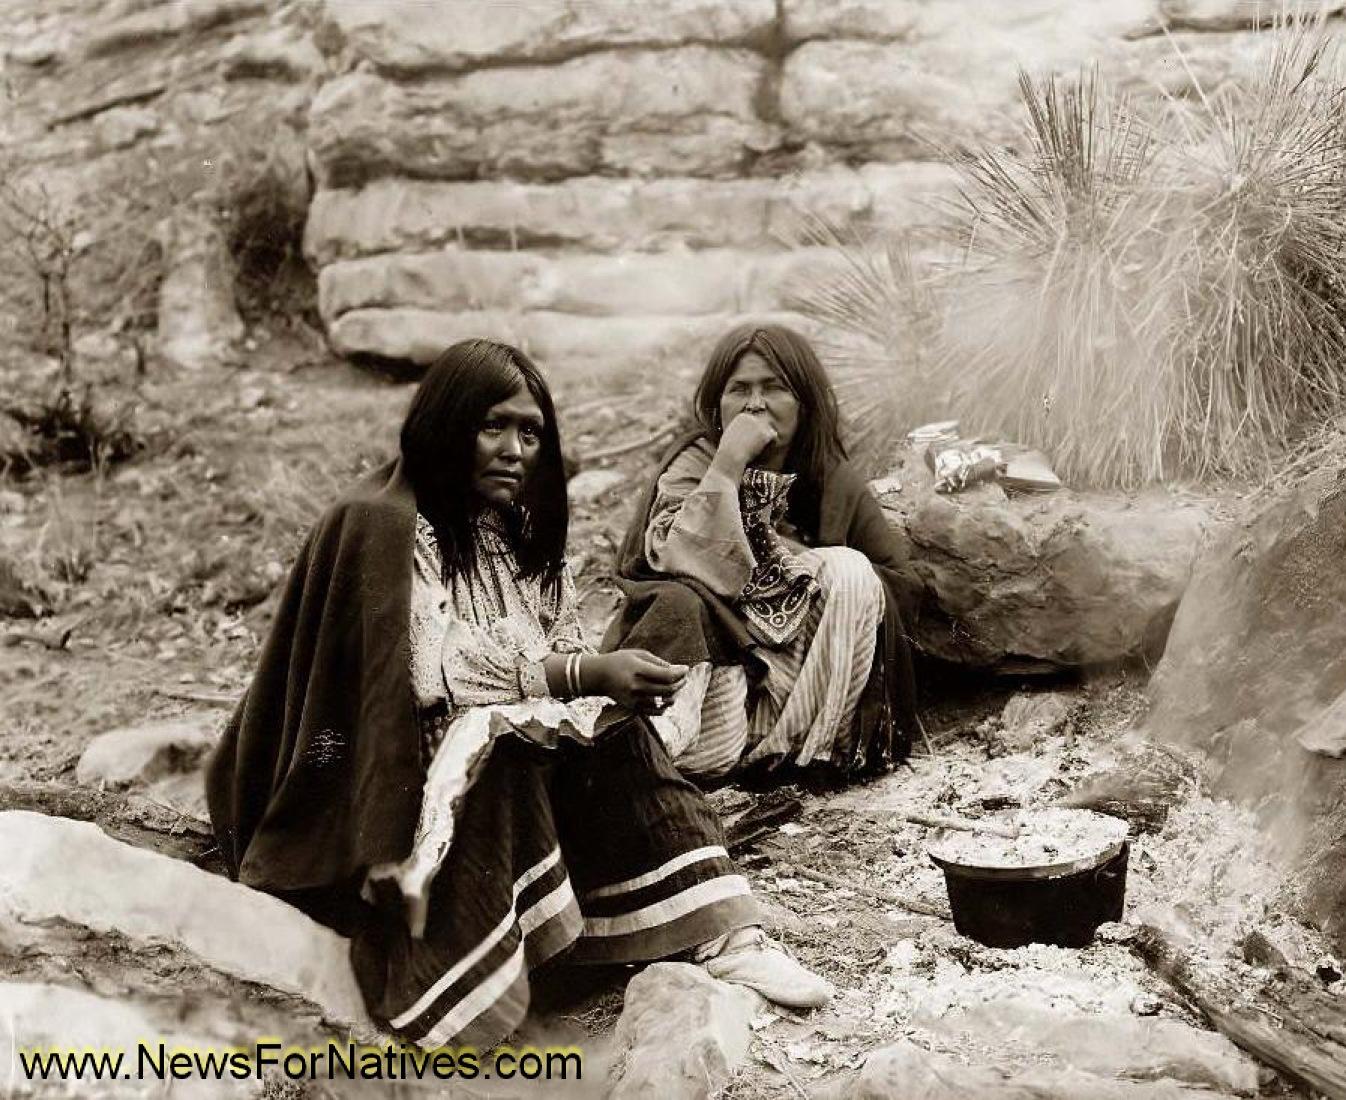 Indijanci na fotografiji i slici - Page 2 Native-american-indians-cooking-camp-campfire-indian-food-old-indian-photo